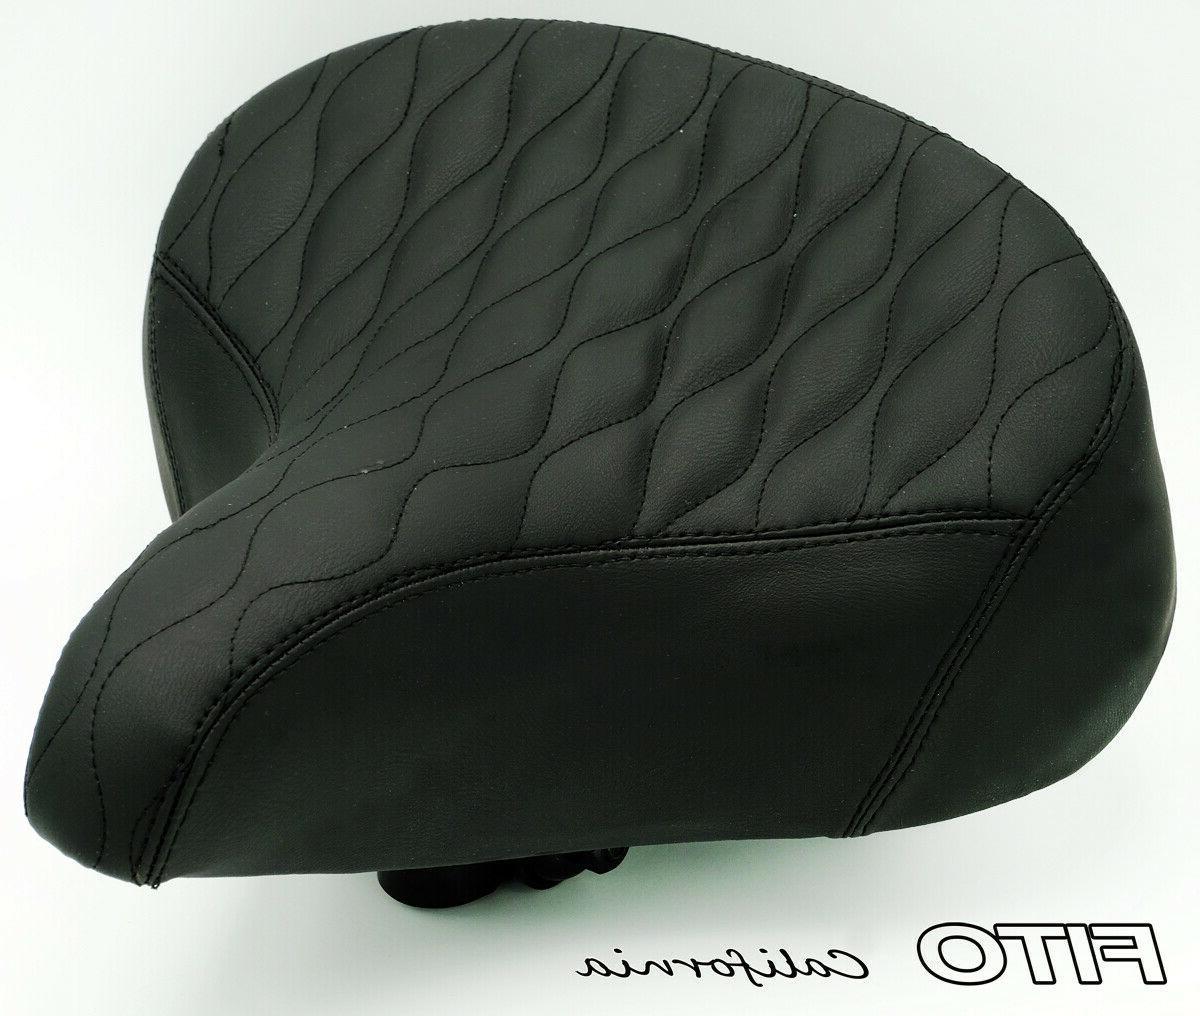 oversize bicycle seat saddle cruiser comfort city